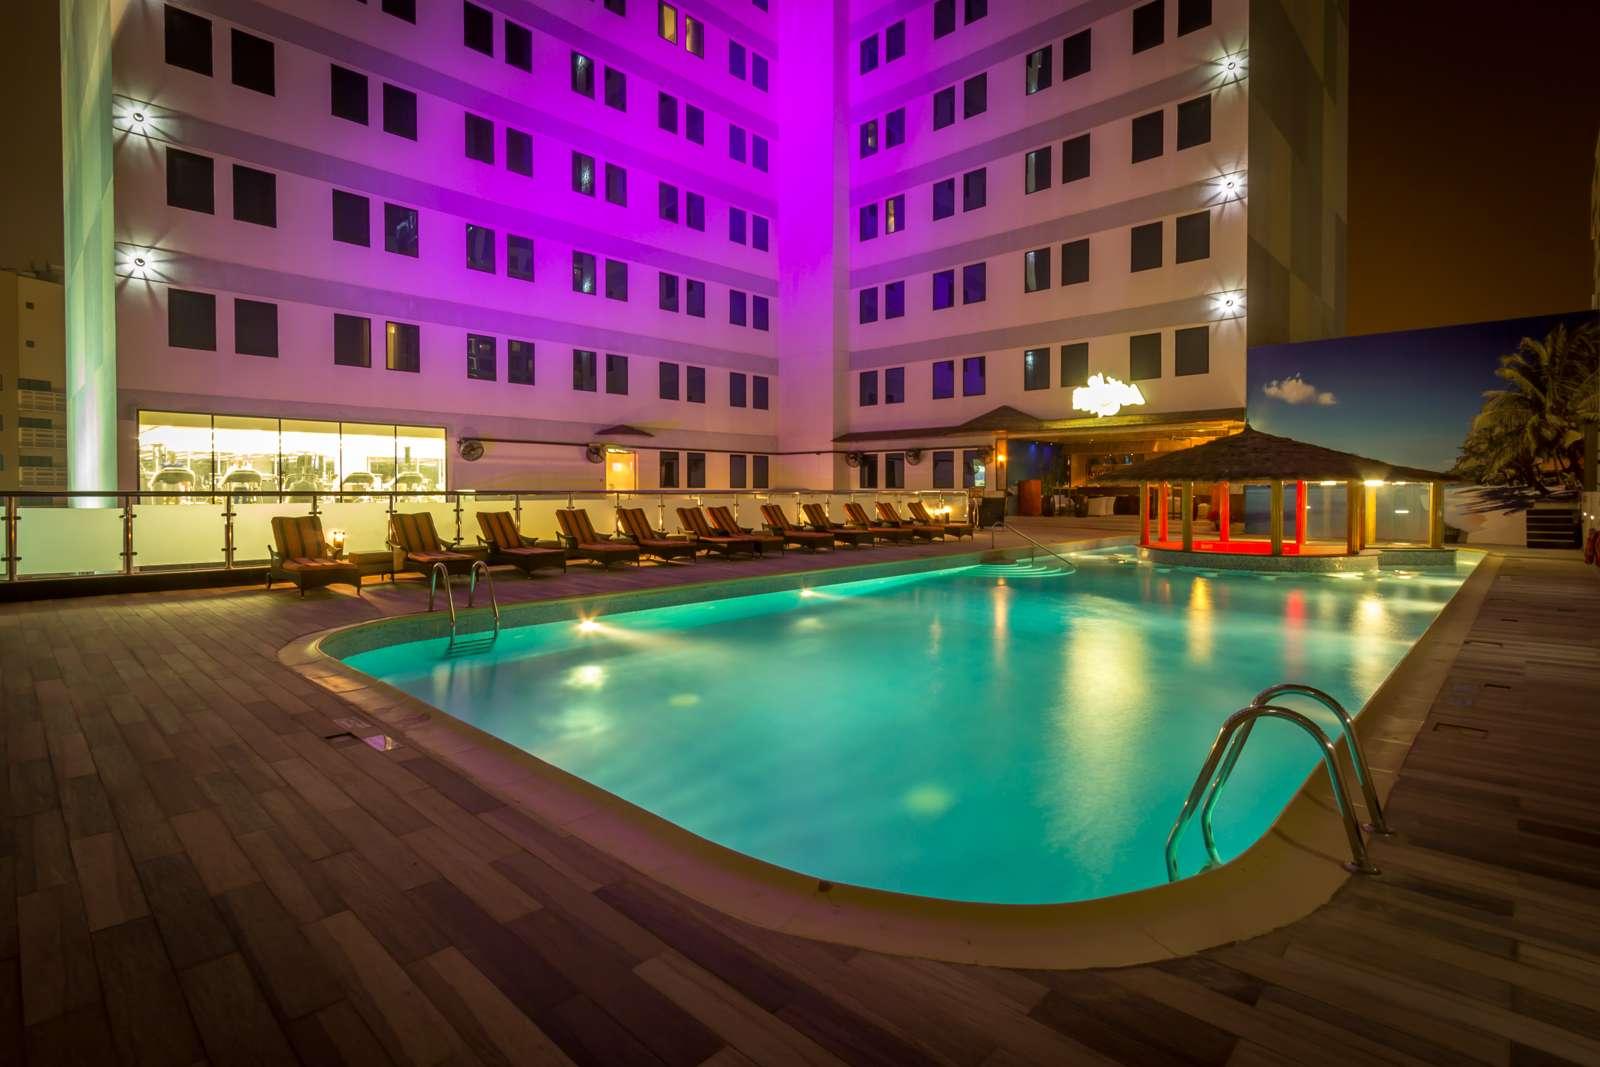 Luxury Hotels in Bahrain | Elite Hospitality Group Bahrain